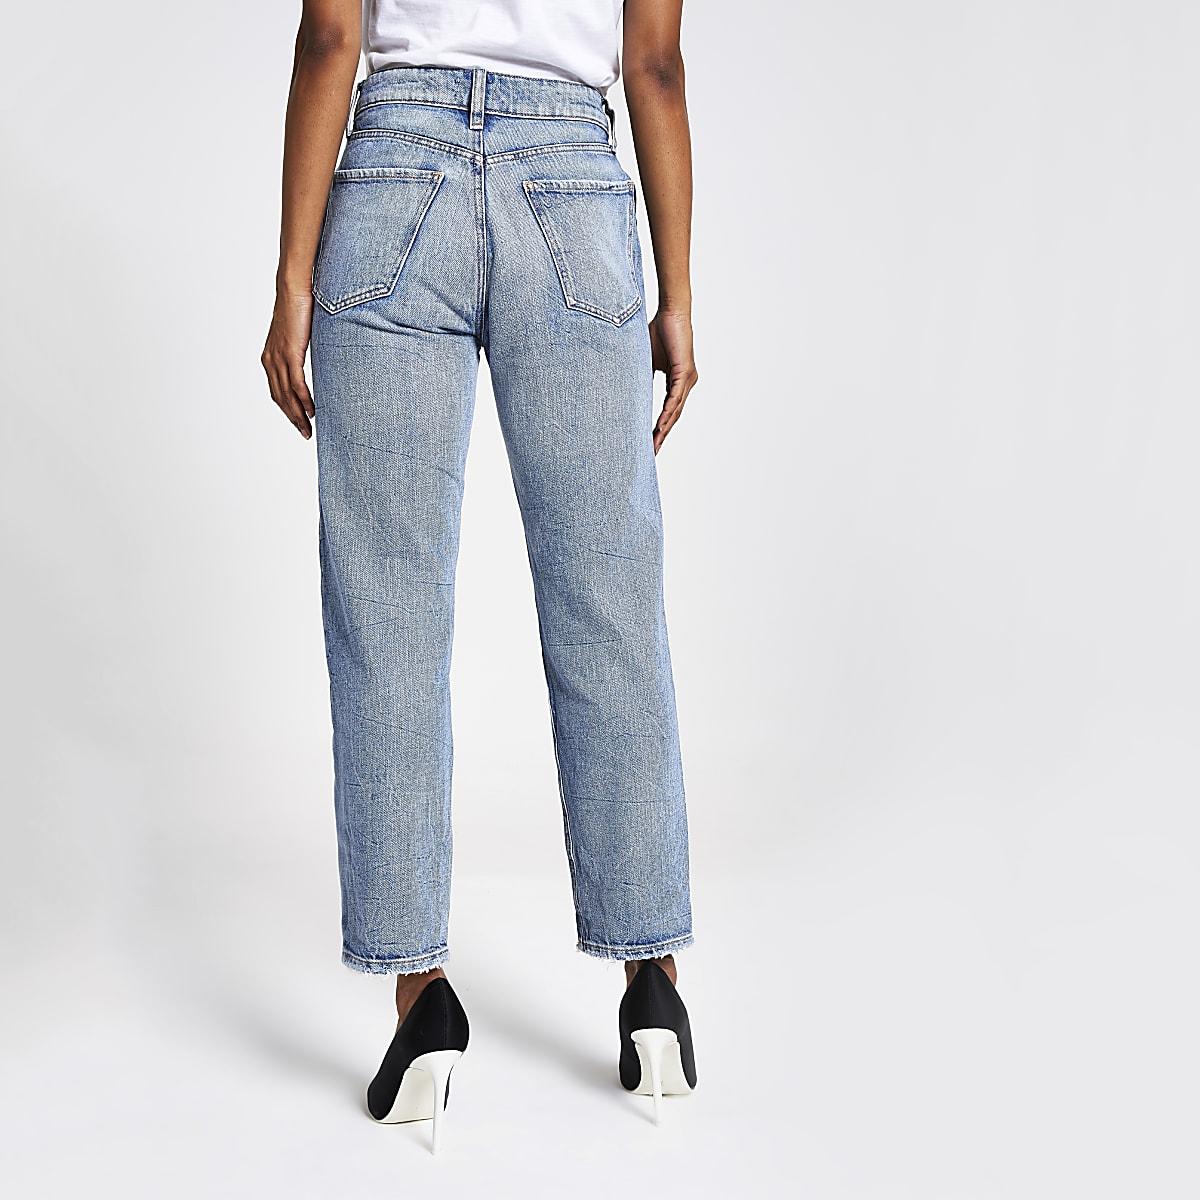 162d13d8482c55 Petite mid blue Mom high rise jeans - Mom Jeans - Jeans - women